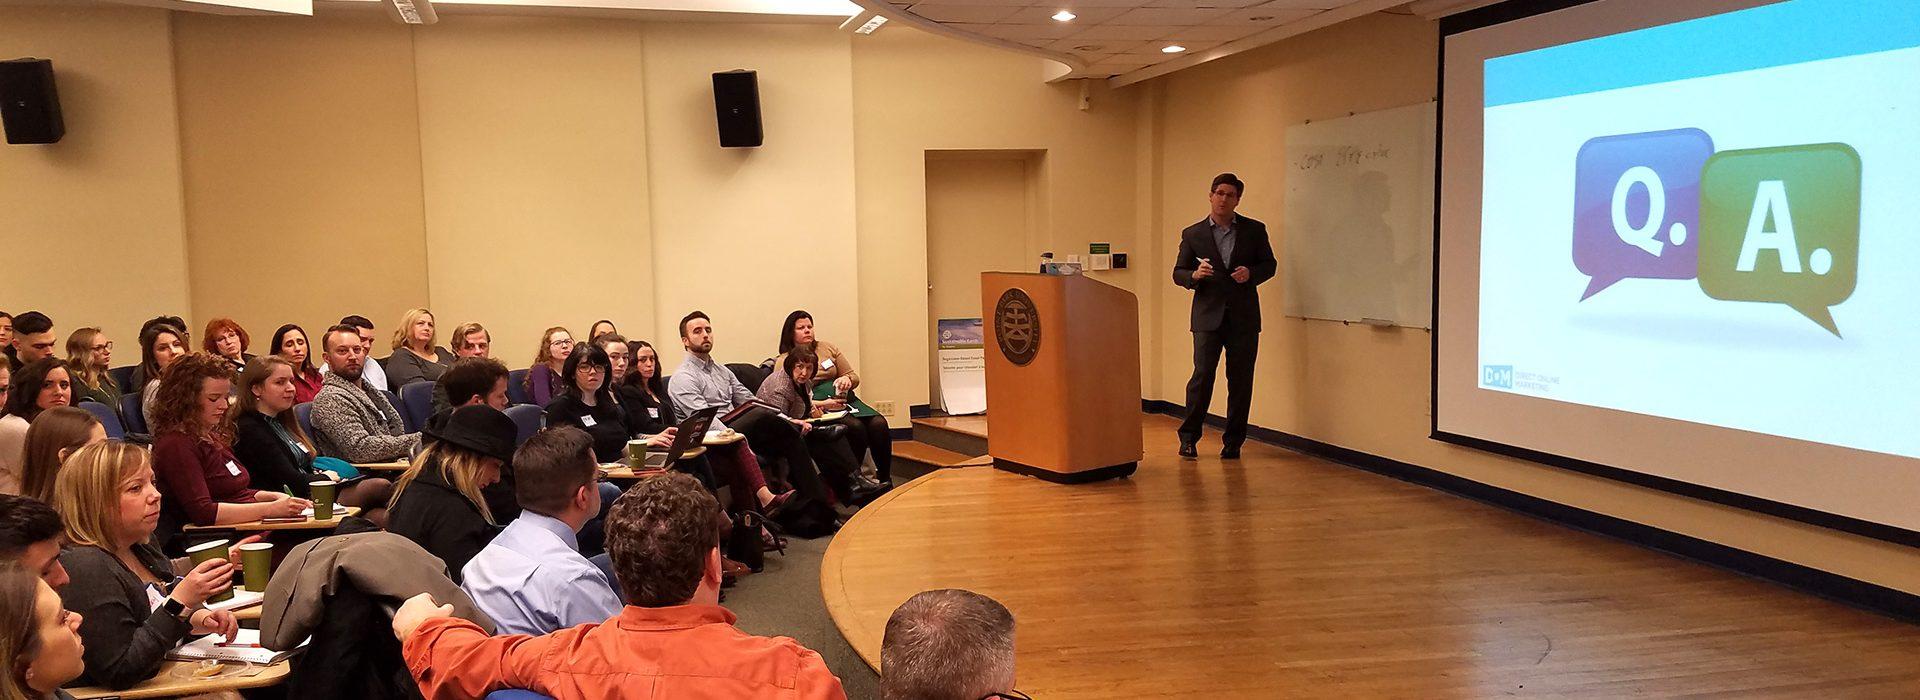 man speaking presentation